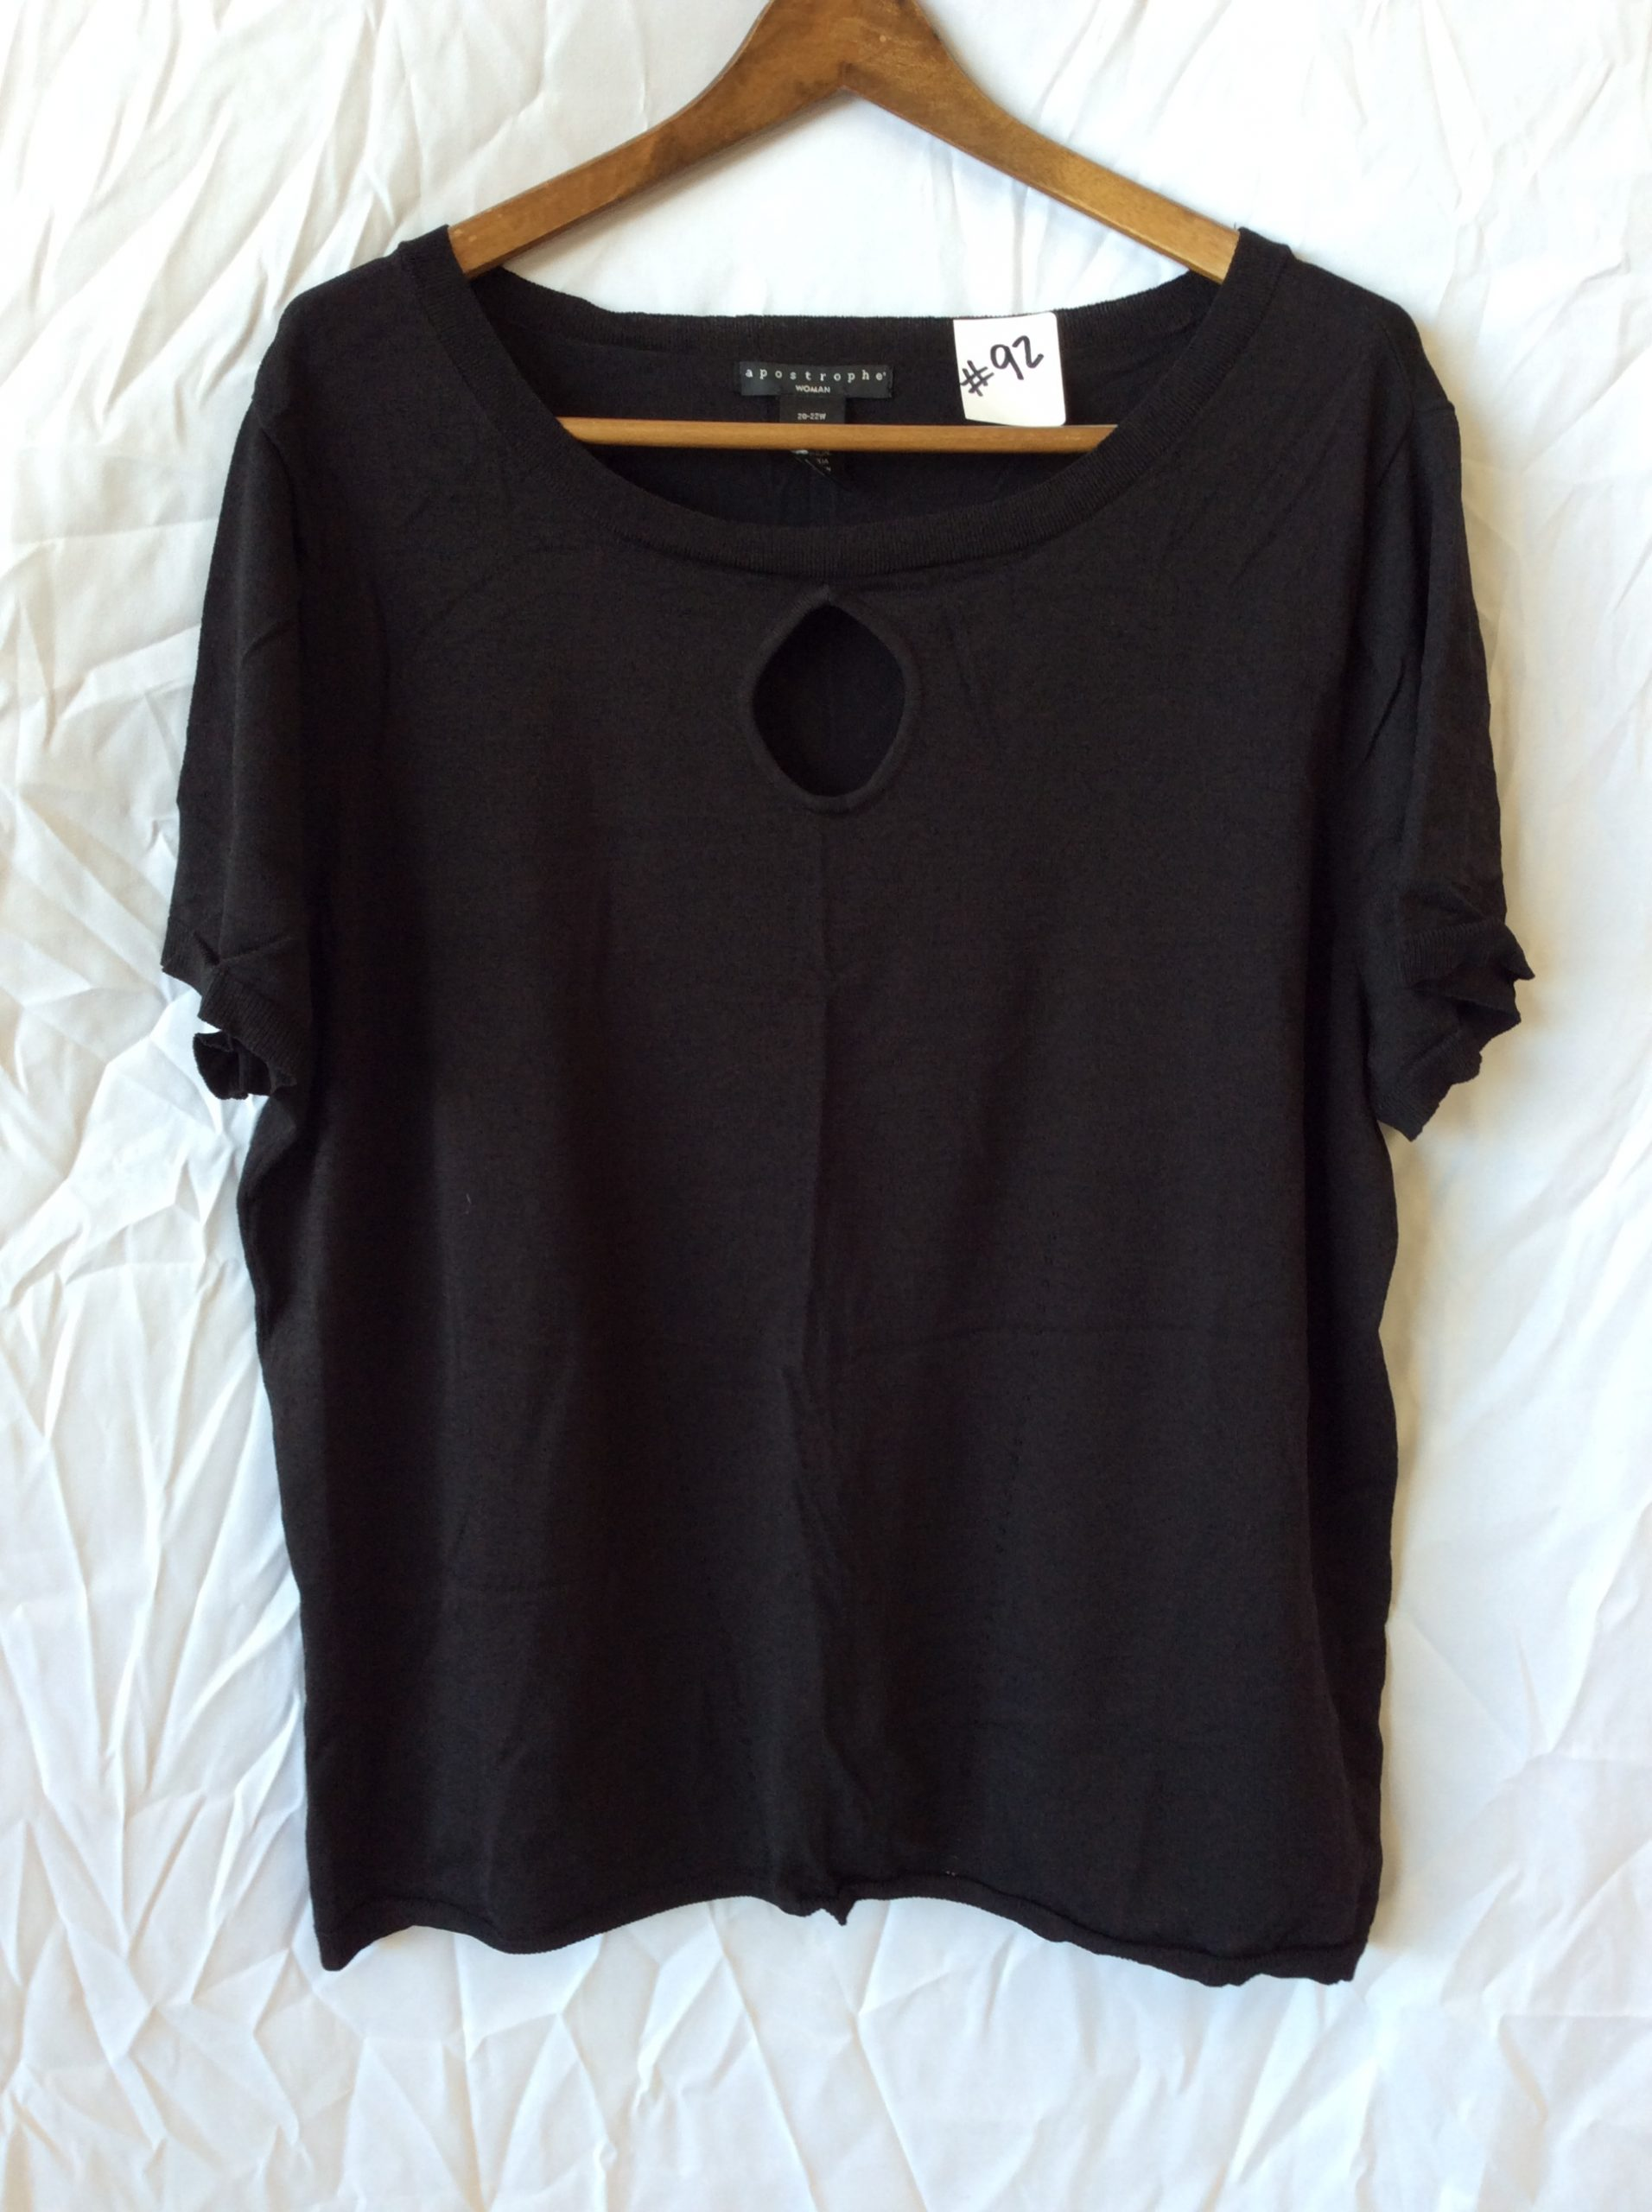 Women's black top, size 20-22